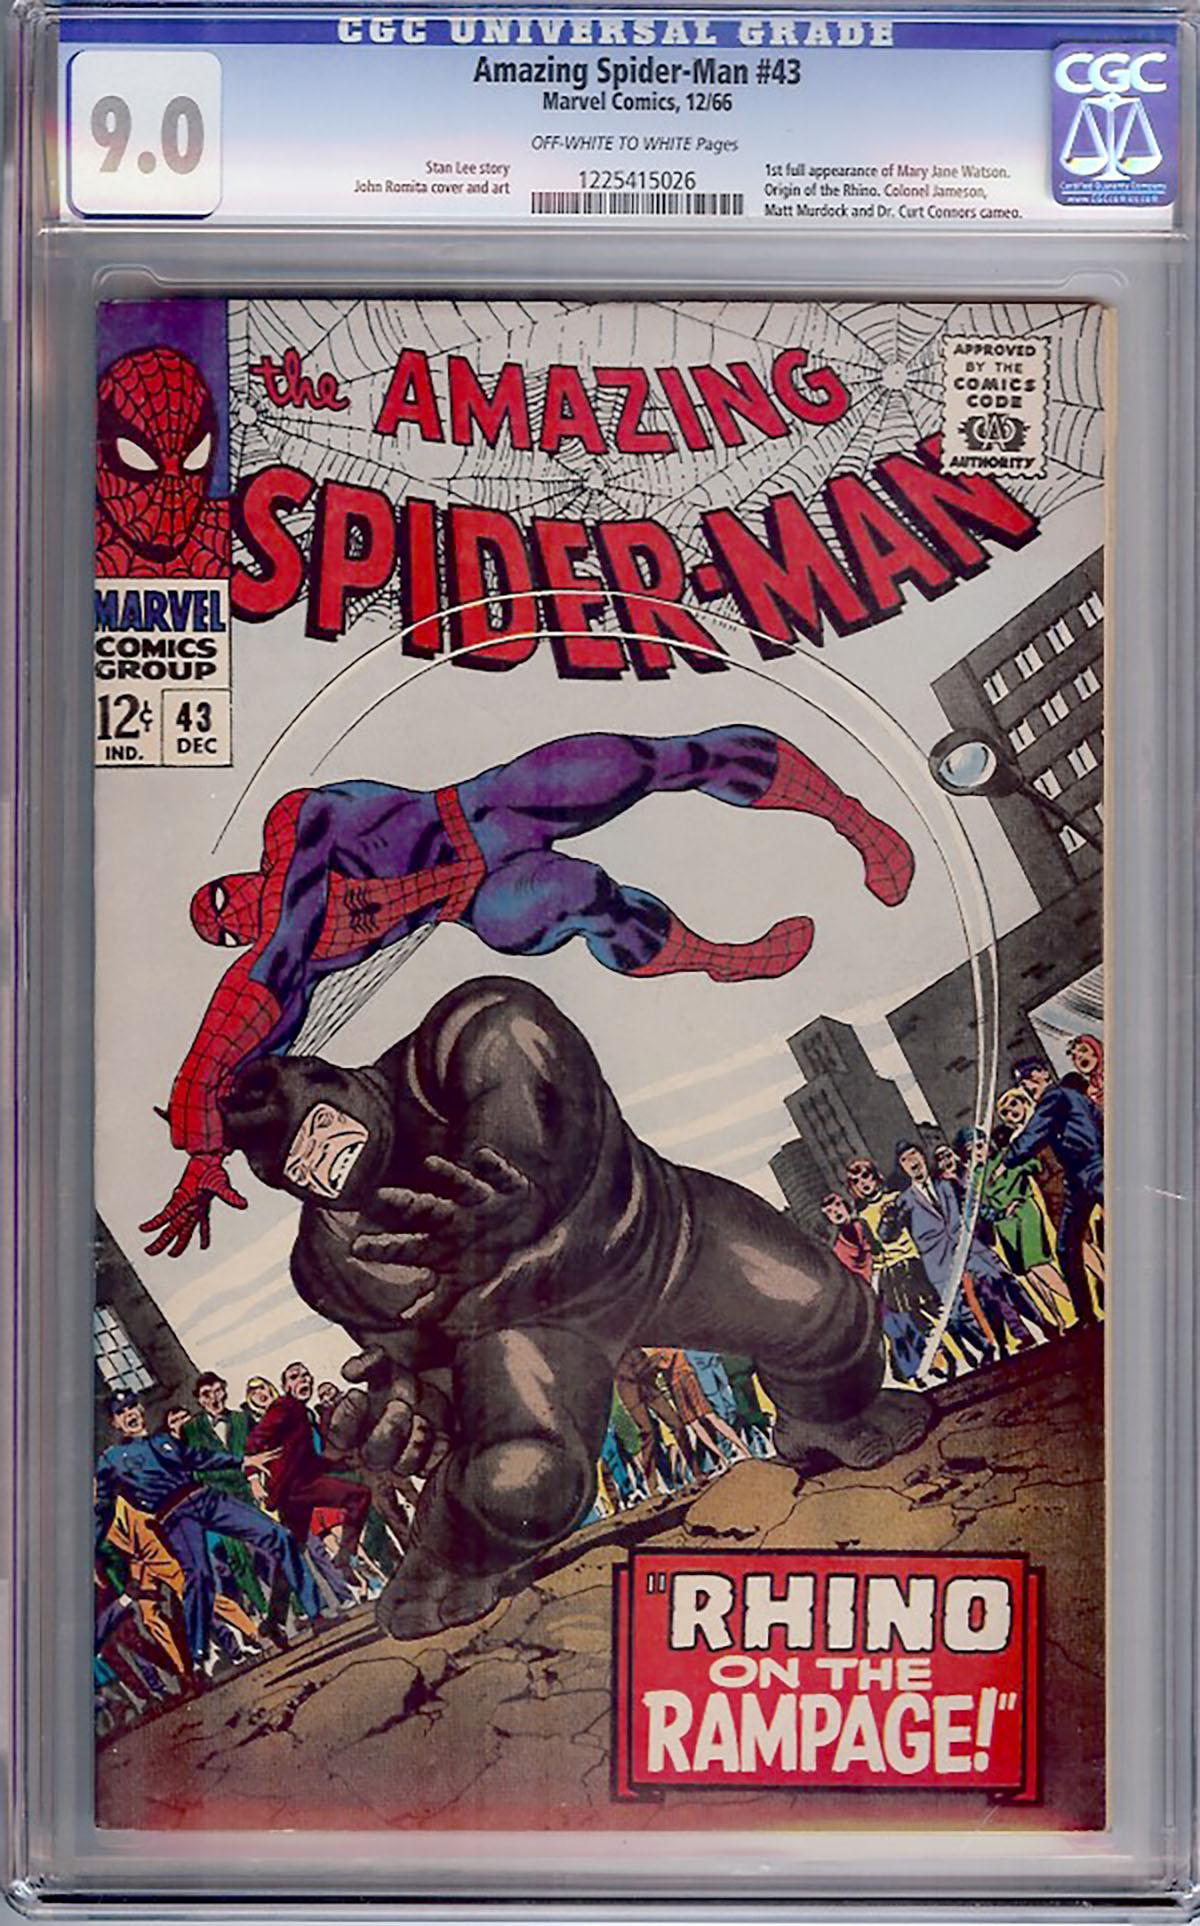 Amazing Spider-Man #43 CGC 9.0 ow/w